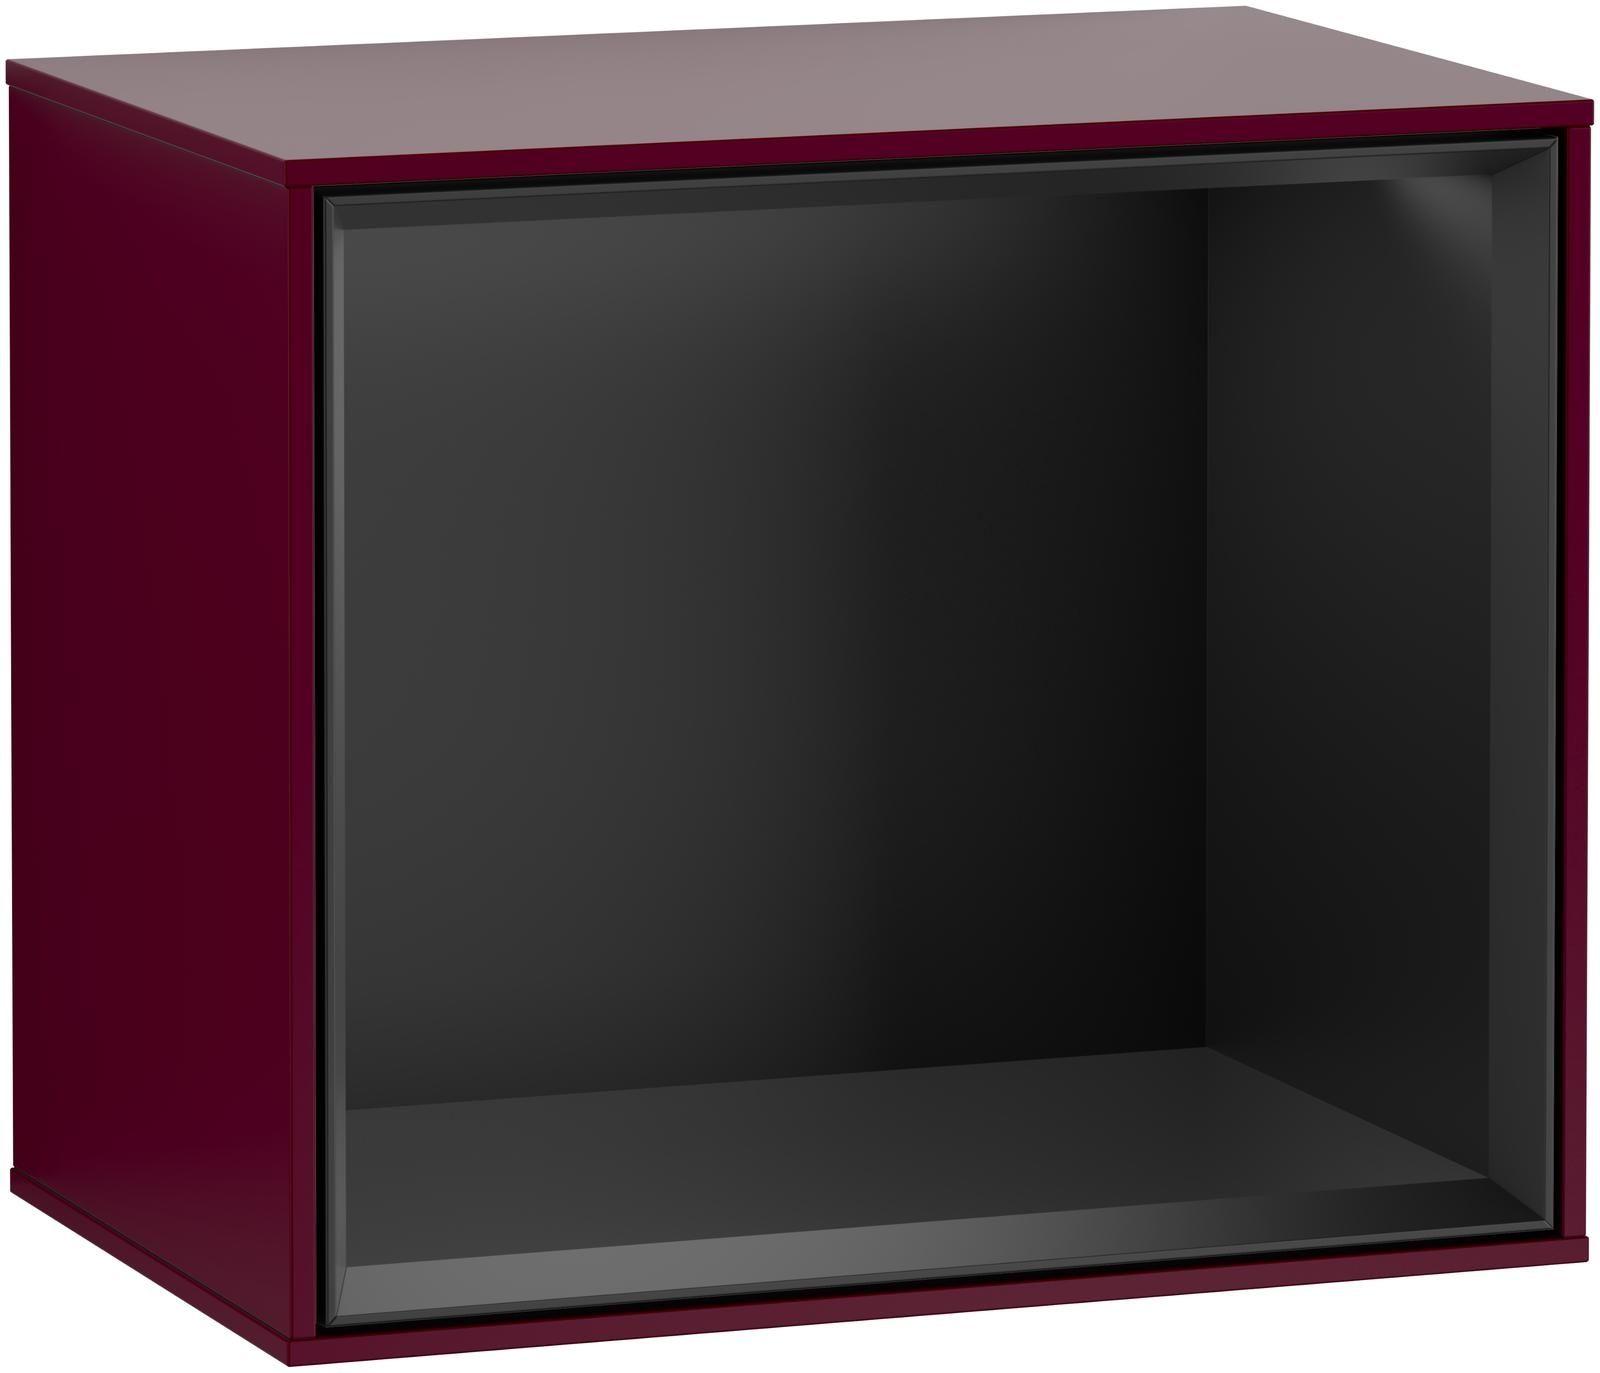 Villeroy & Boch Finion F59 Regalmodul LED-Beleuchtung B:41,8xH:35,6xT:27cm Front, Korpus: Peony, Regal: Black Matt Lacquer F590PDHB